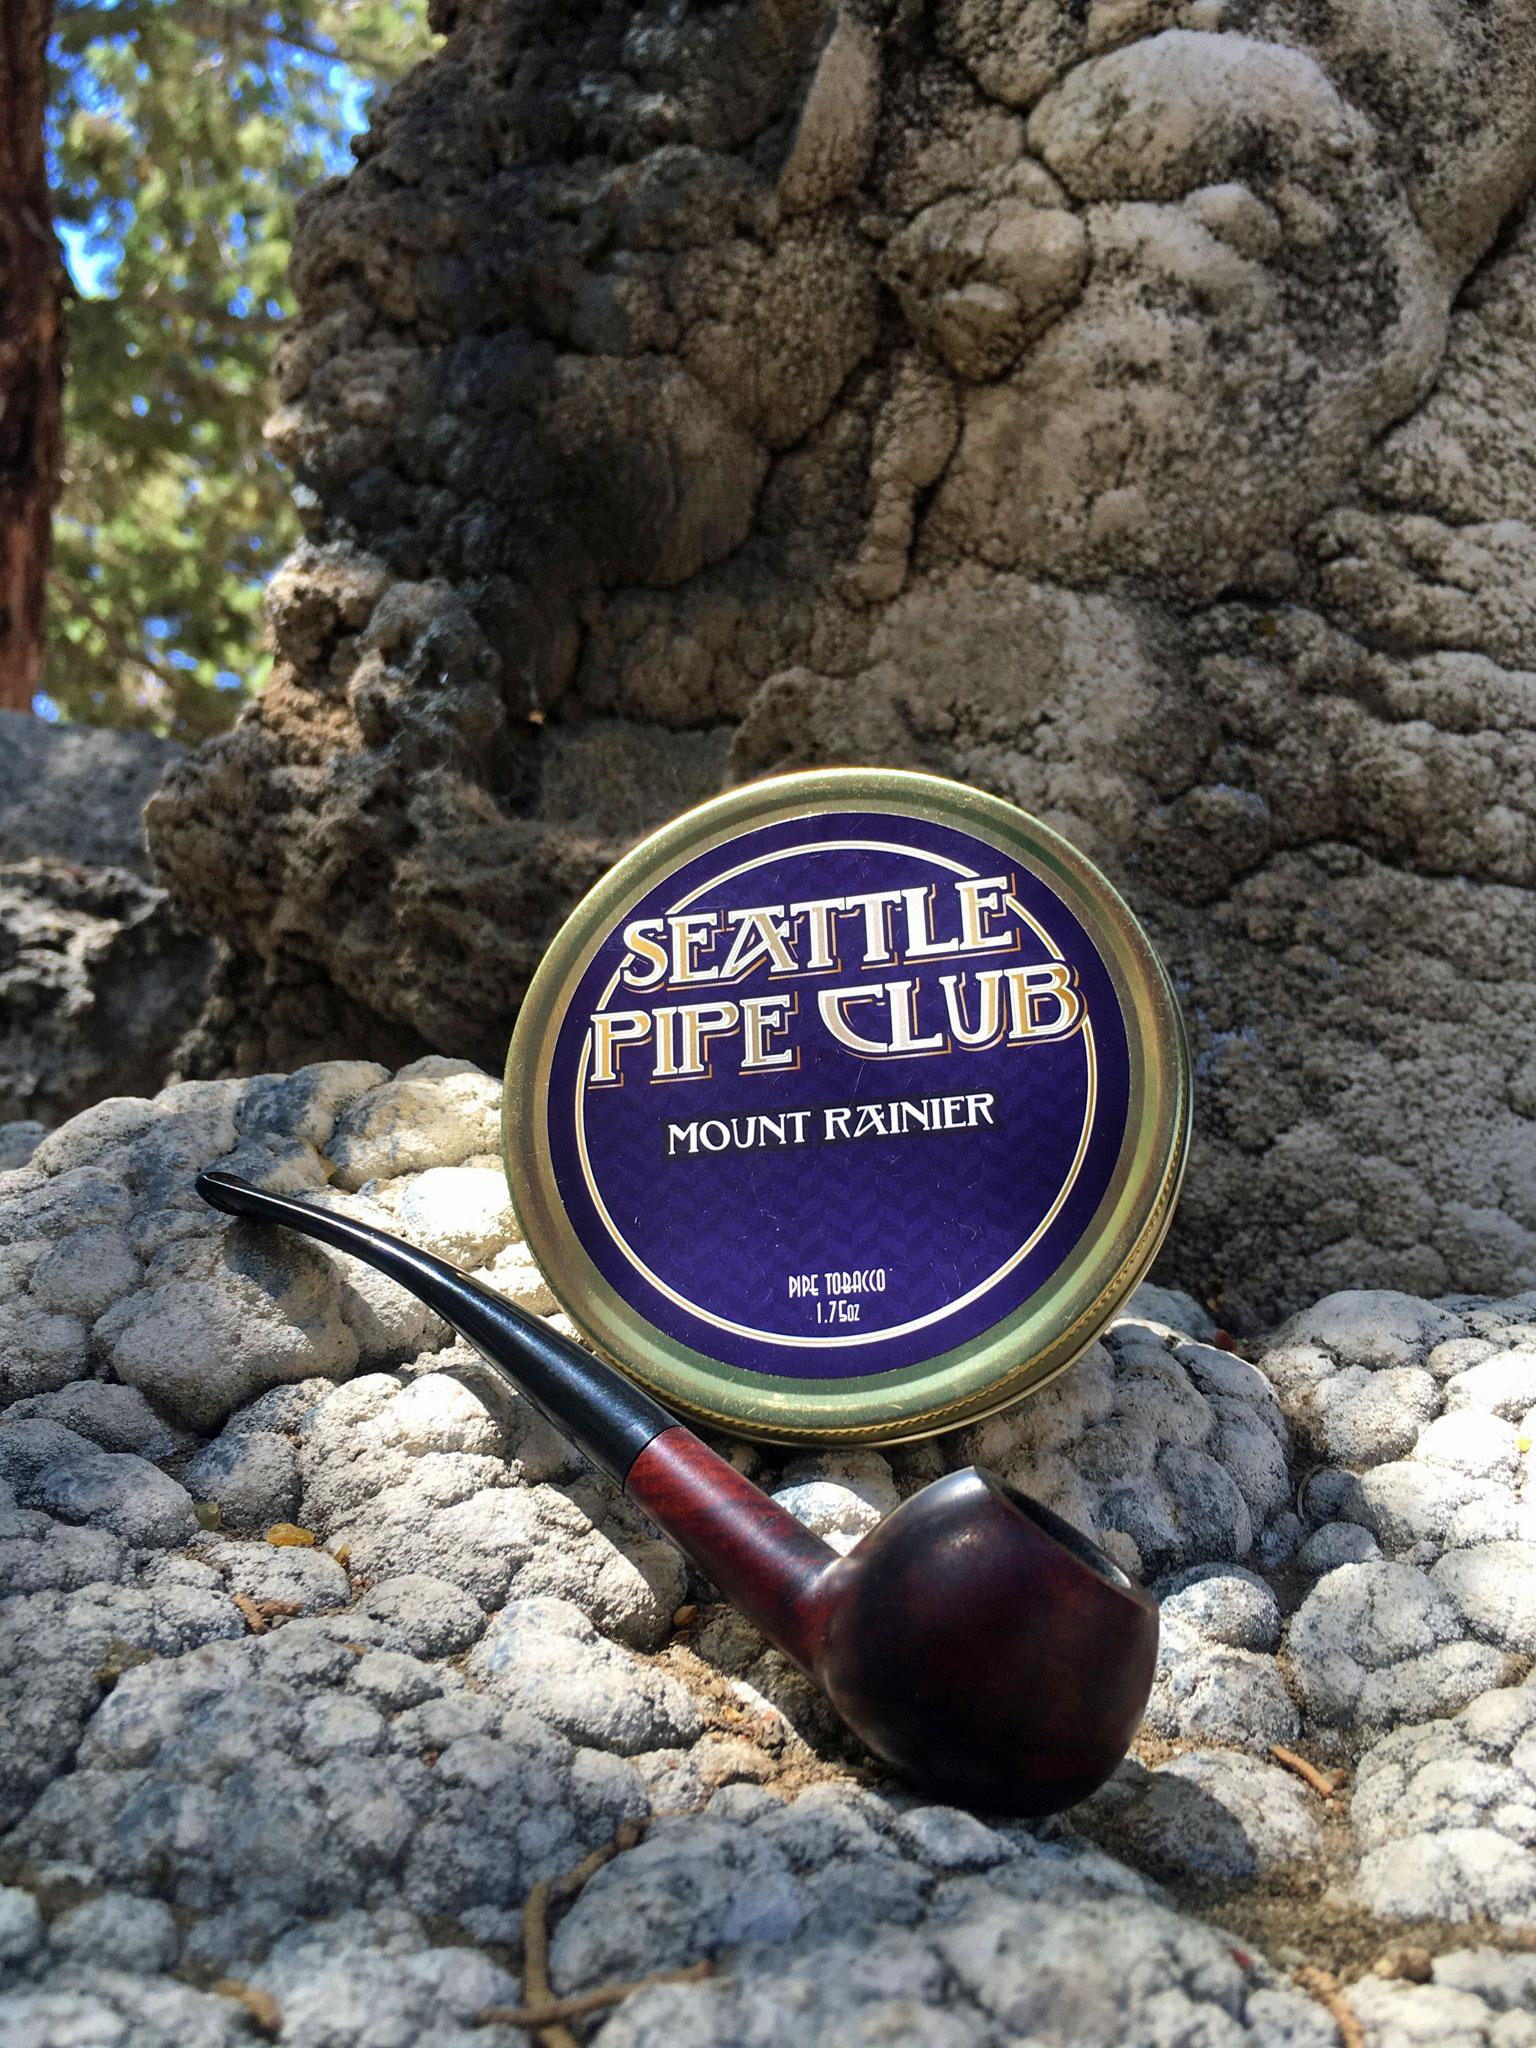 Seattle Pipe Club Mount Rainier